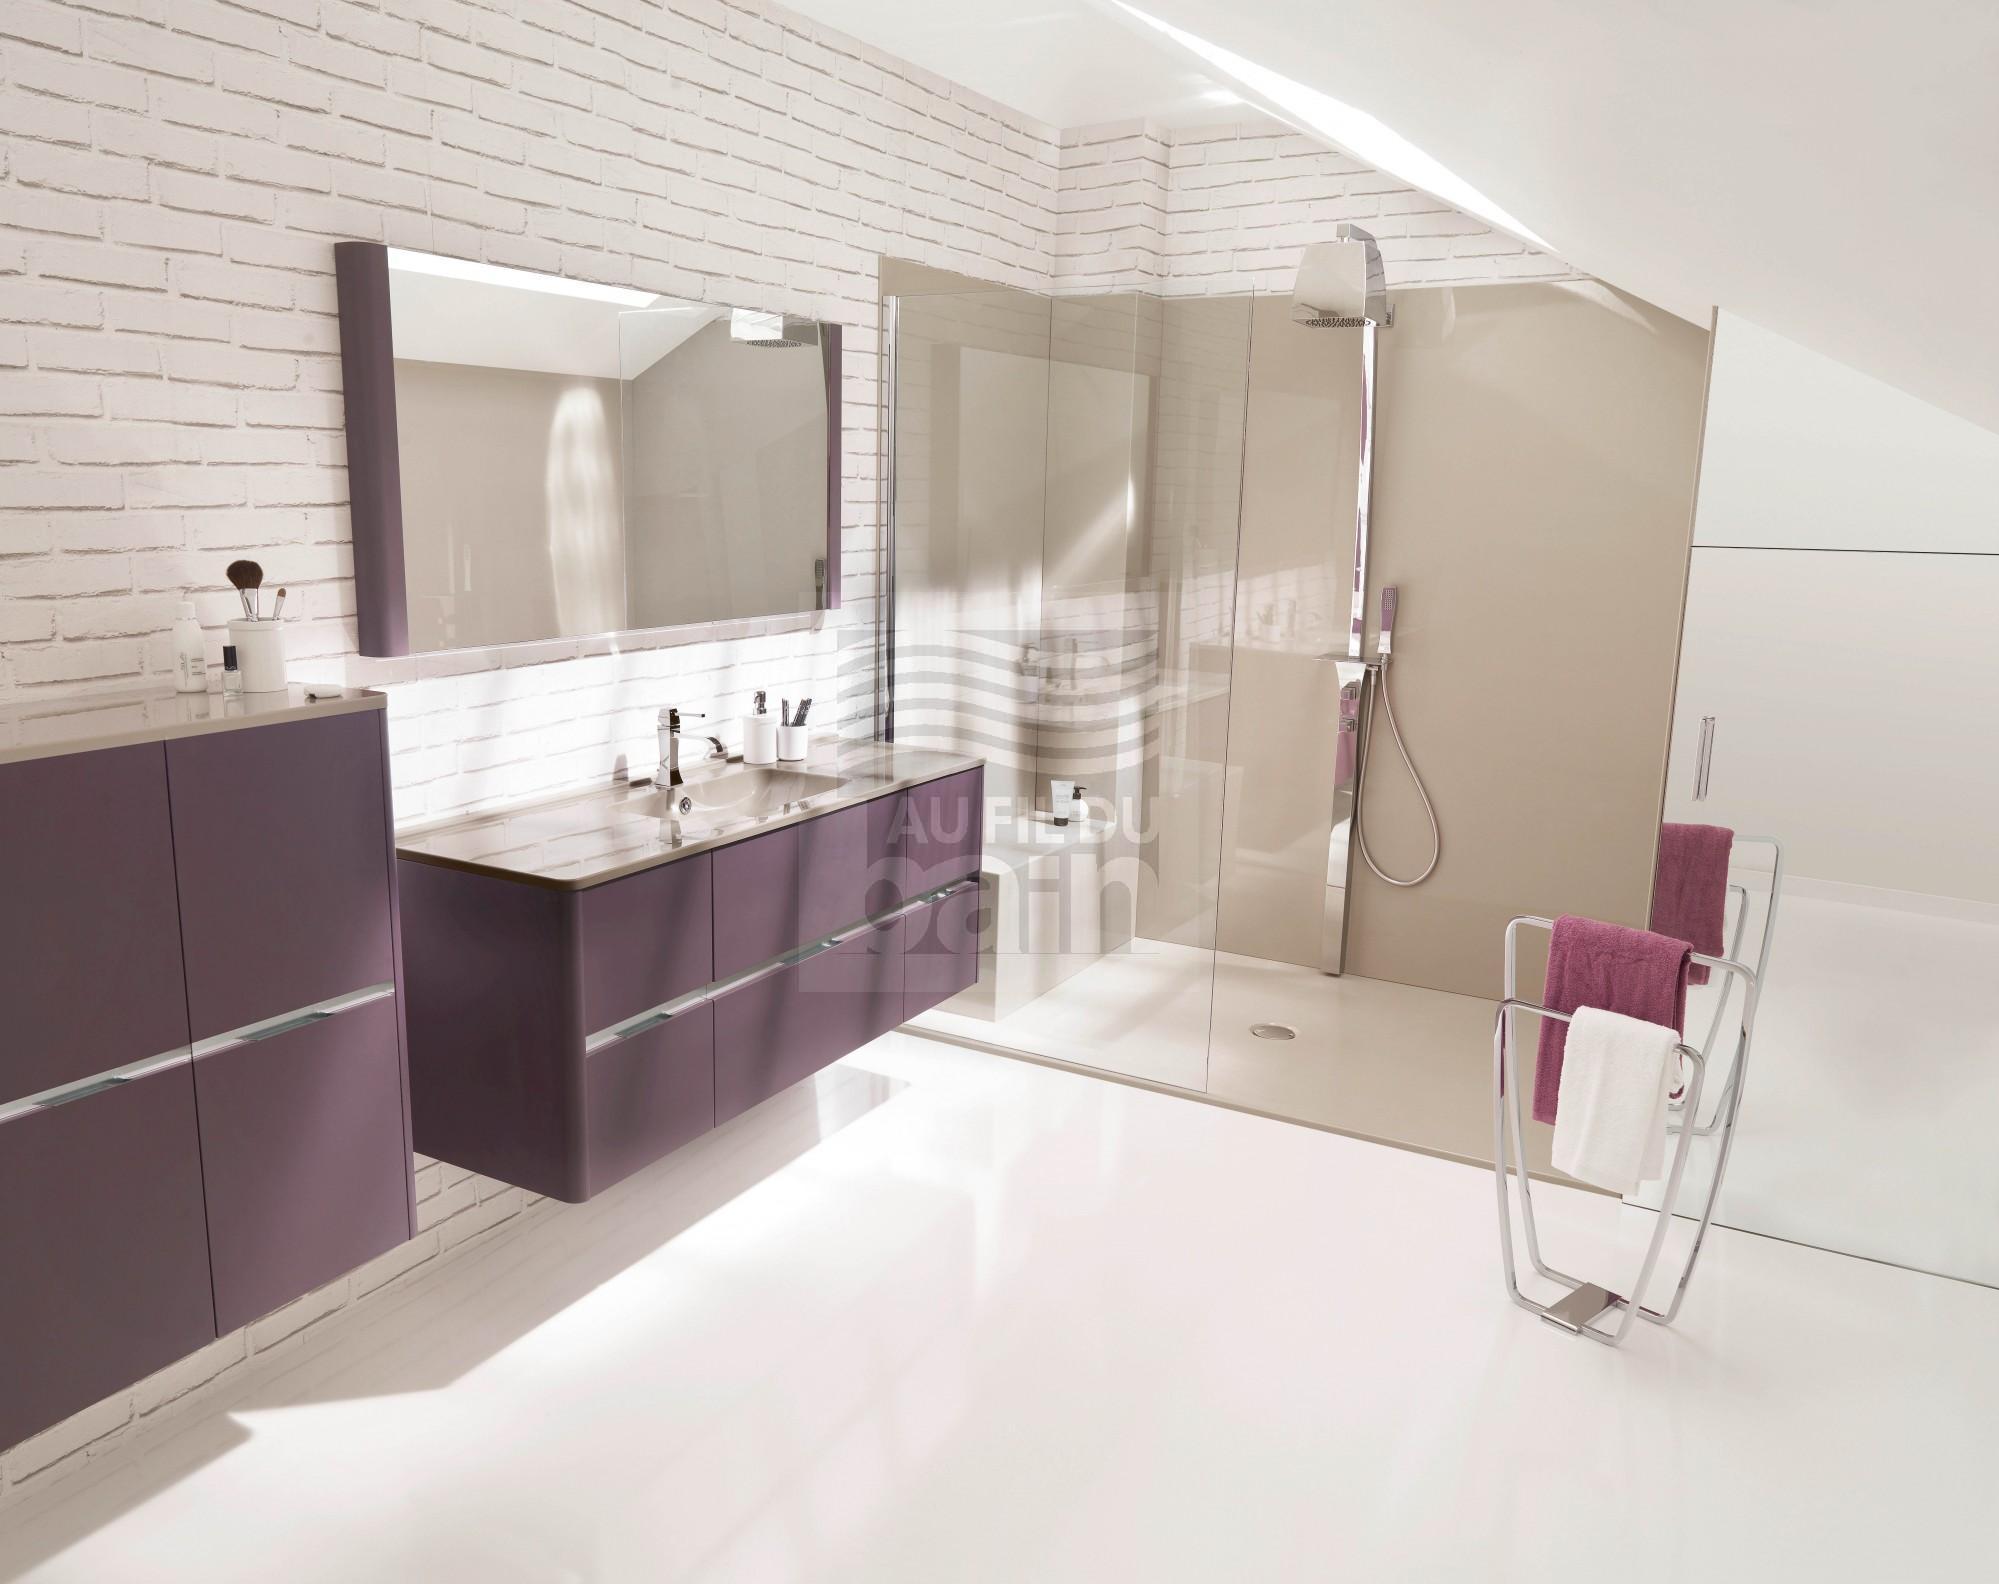 Meubles de salle de bains suspendus double vasque avec plan en beton de synthese ambiance bain - Plan salle de bain moderne ...